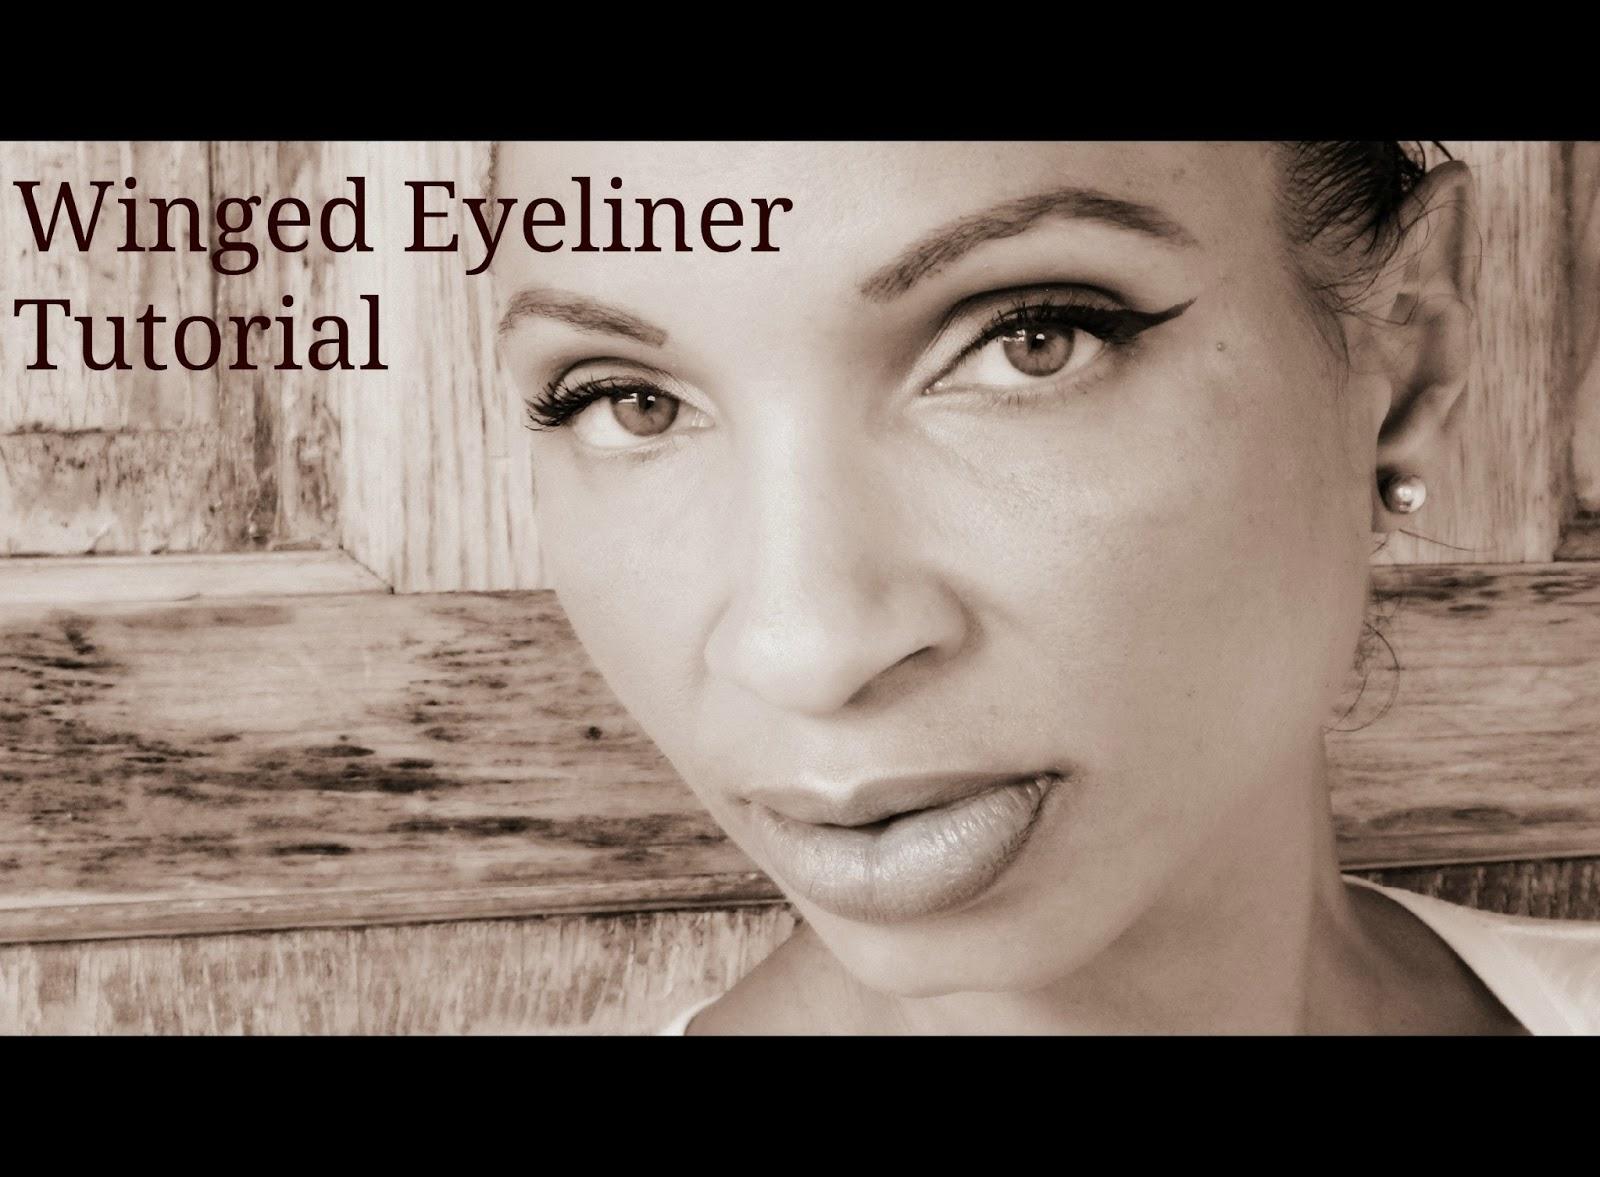 http://chrysalisglam101.blogspot.com/2014/08/easy-winged-eyeliner-tutorial.html